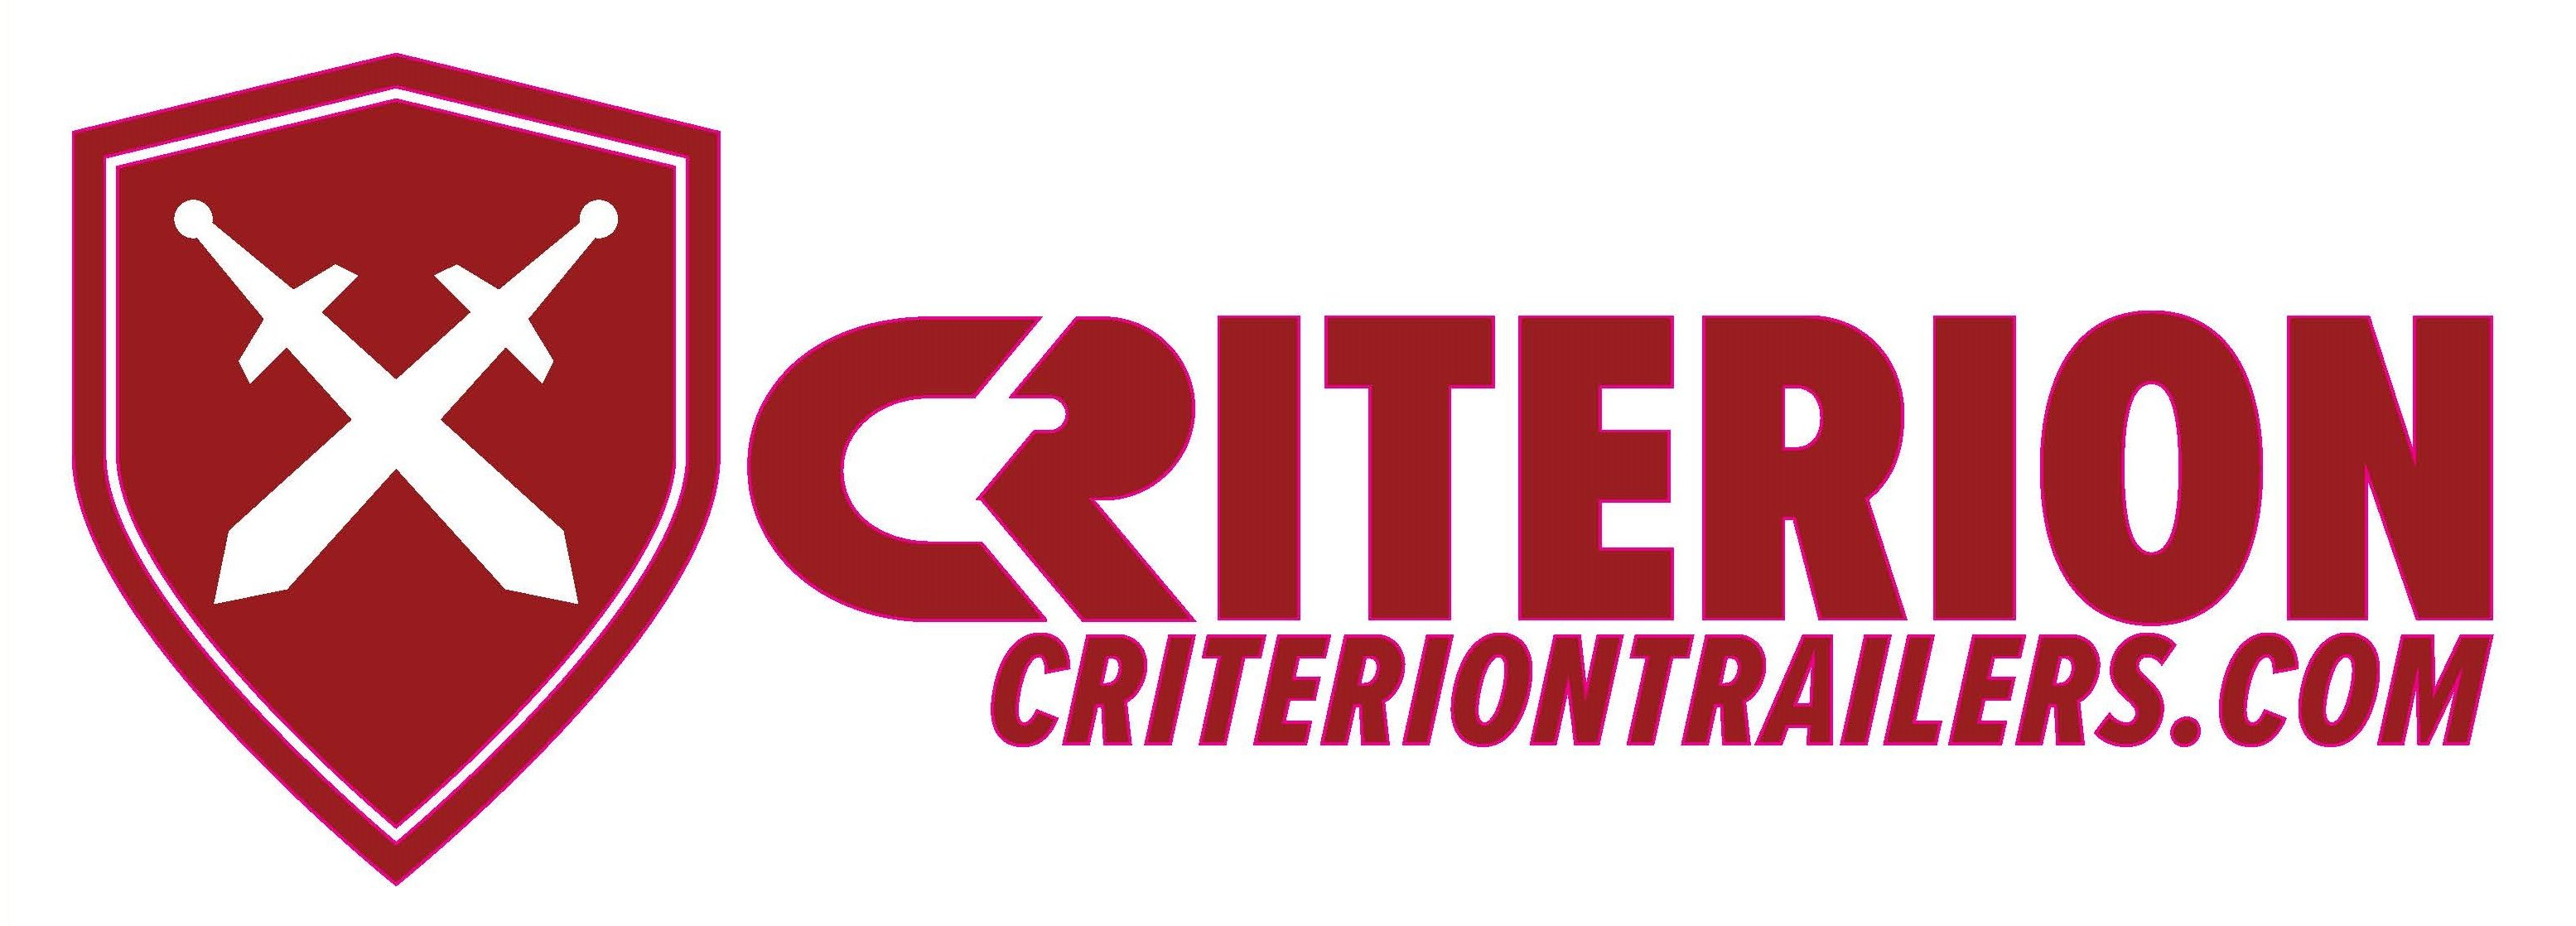 Criterion Trailers LLC